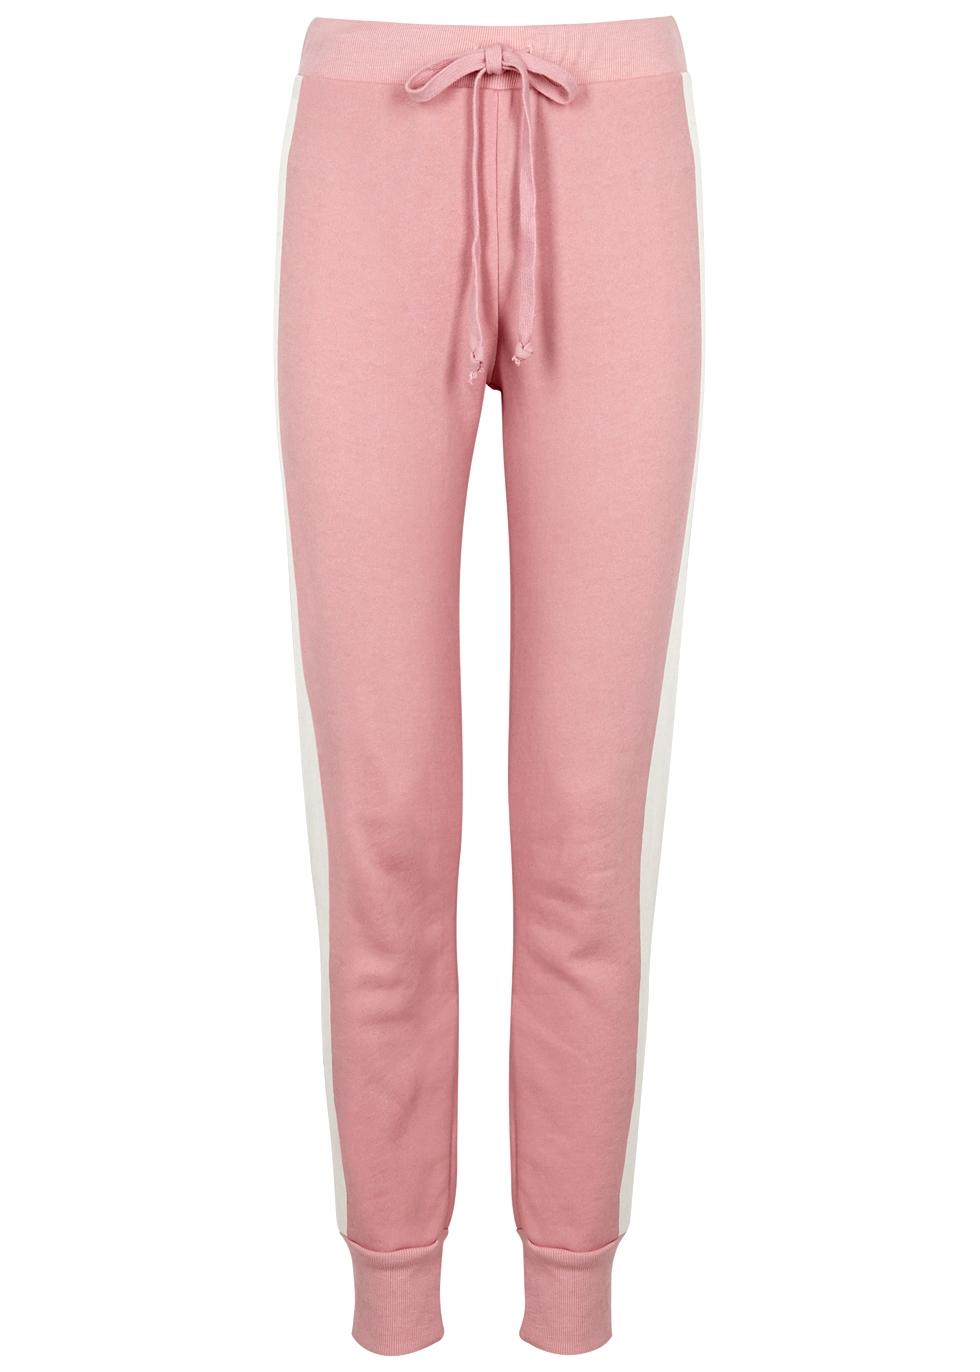 Fleece Trousers Jogging Harvey Jack Wildfox Stripe Varsity Nichols Rj5Aq3LSc4